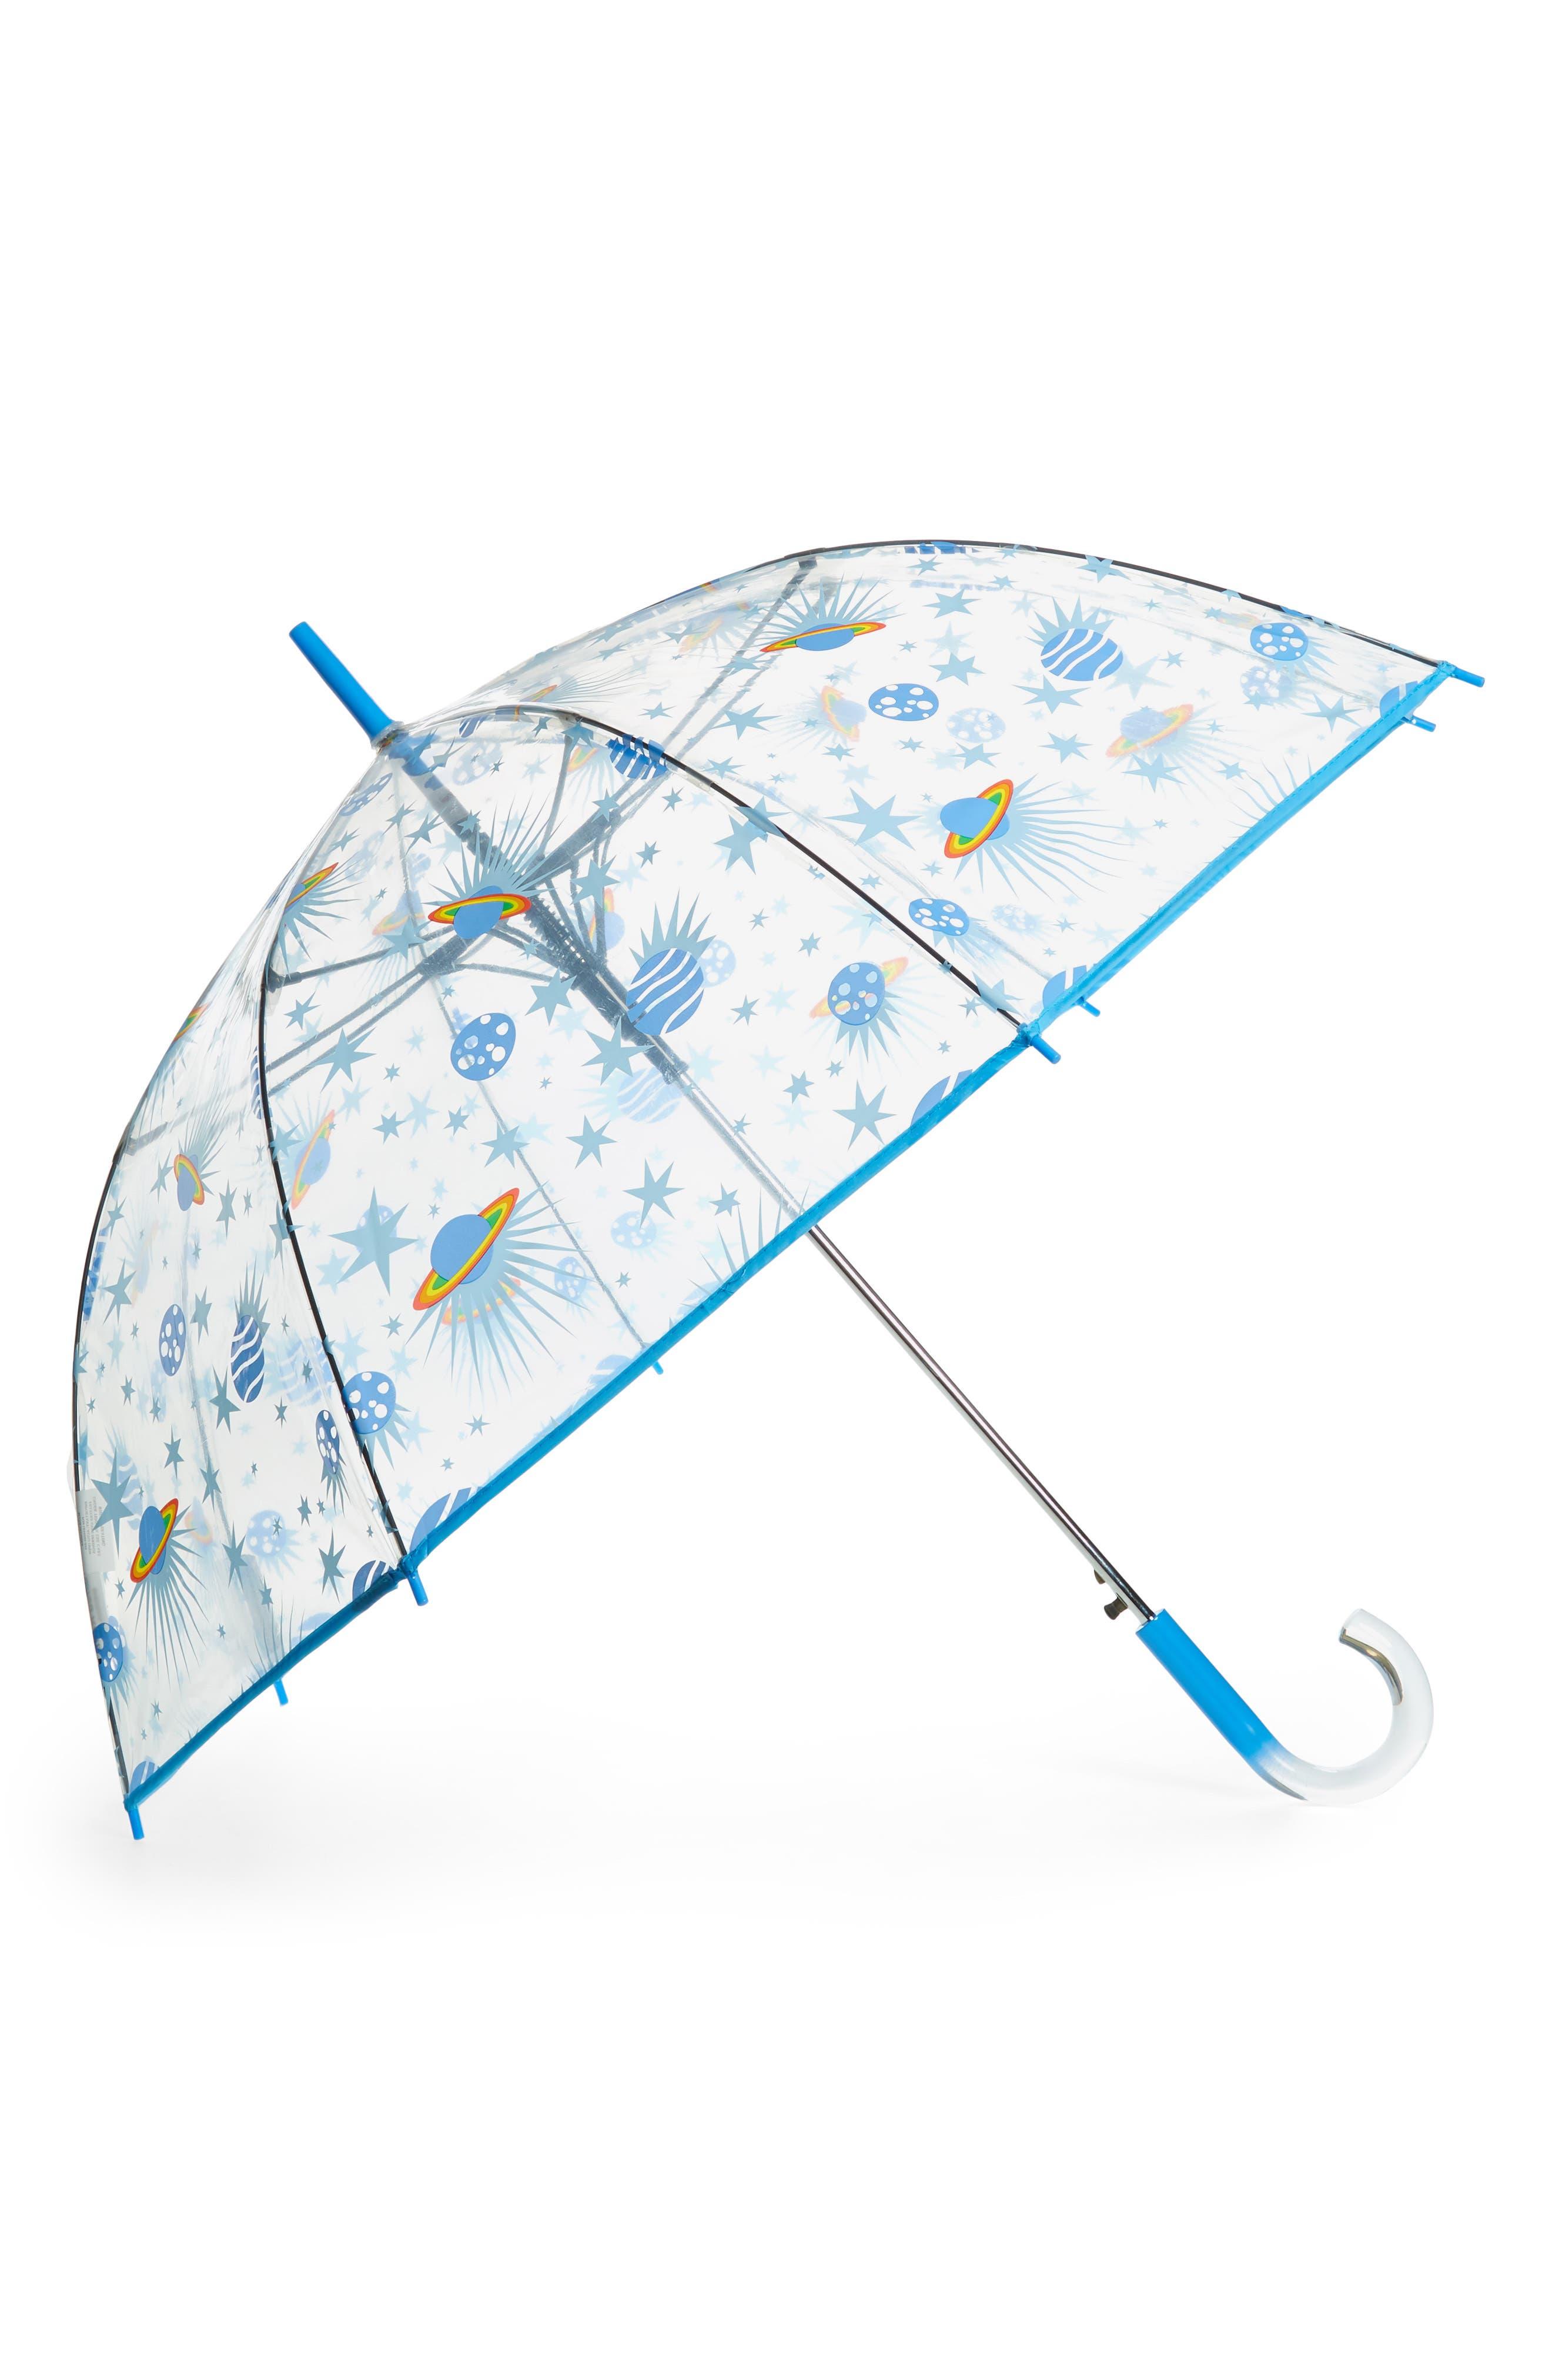 'The Bubble' Auto Open Stick Umbrella,                             Main thumbnail 1, color,                             GAZER